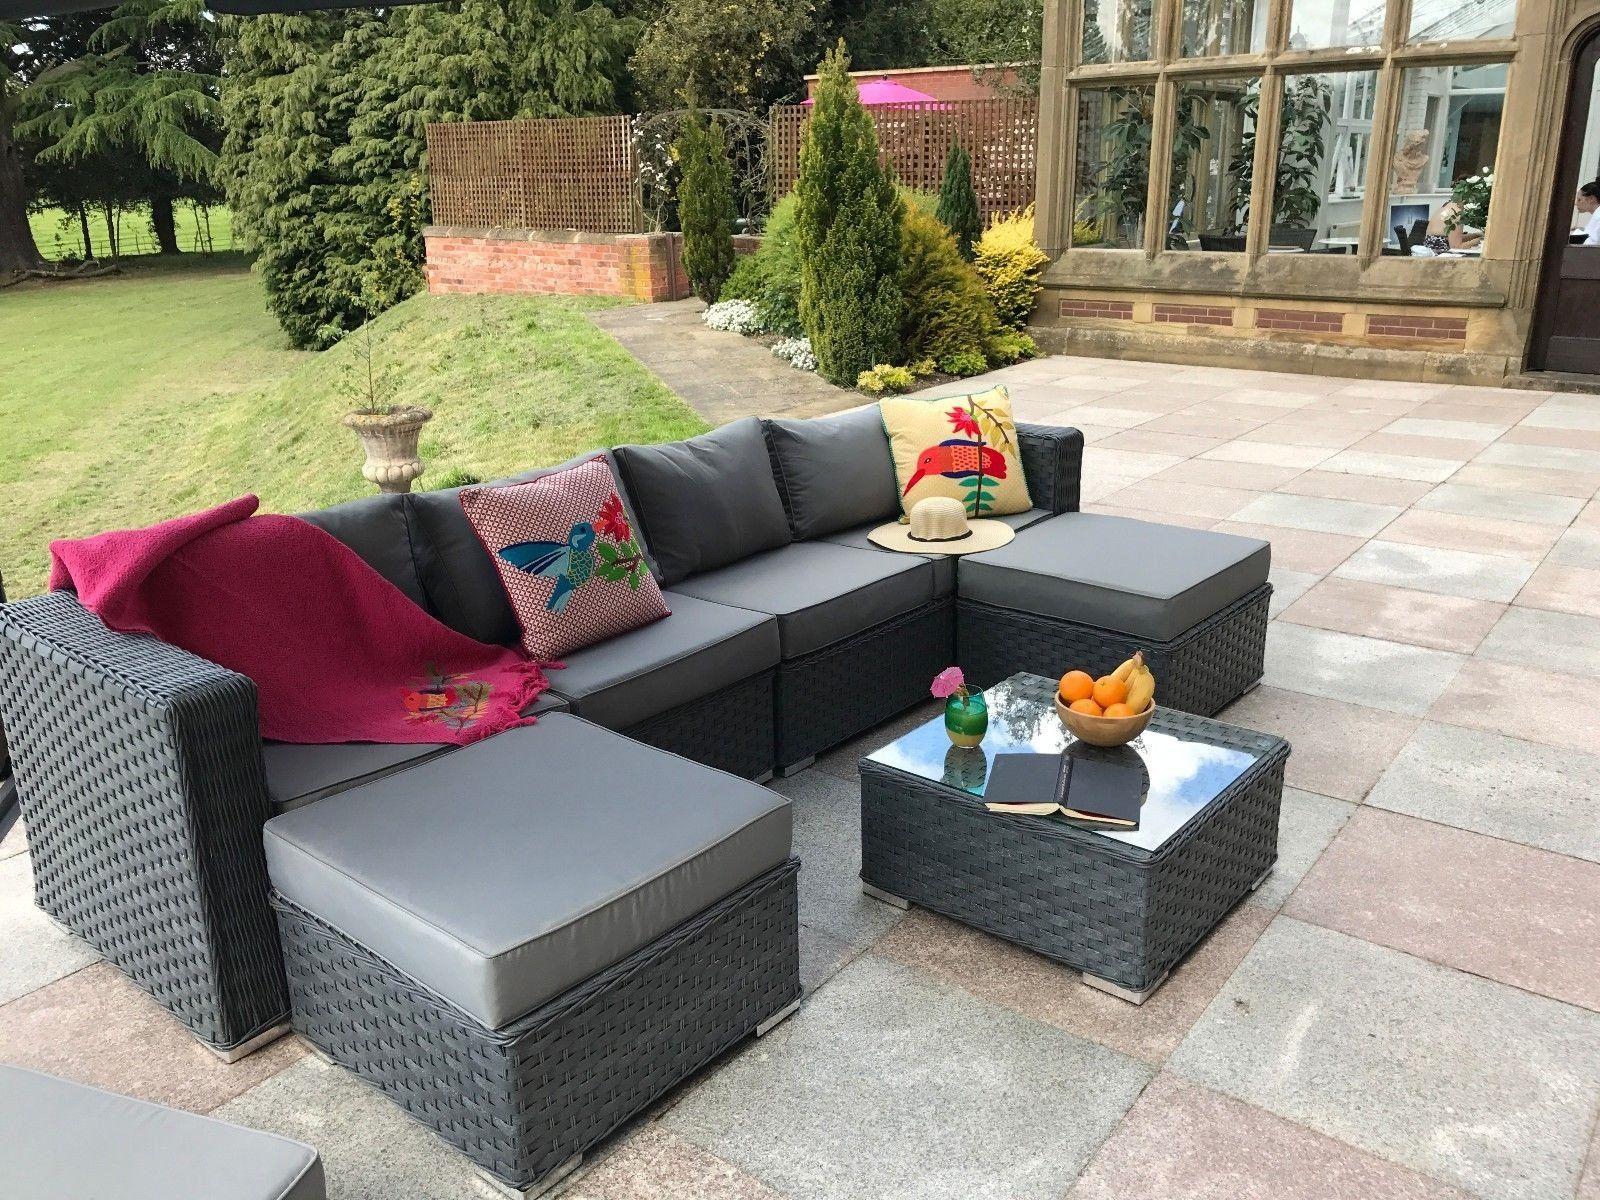 6ba96380cde1 £395 Yakoe® Papaver 6 Seater Black Garden Furniture | Furniture Maxi